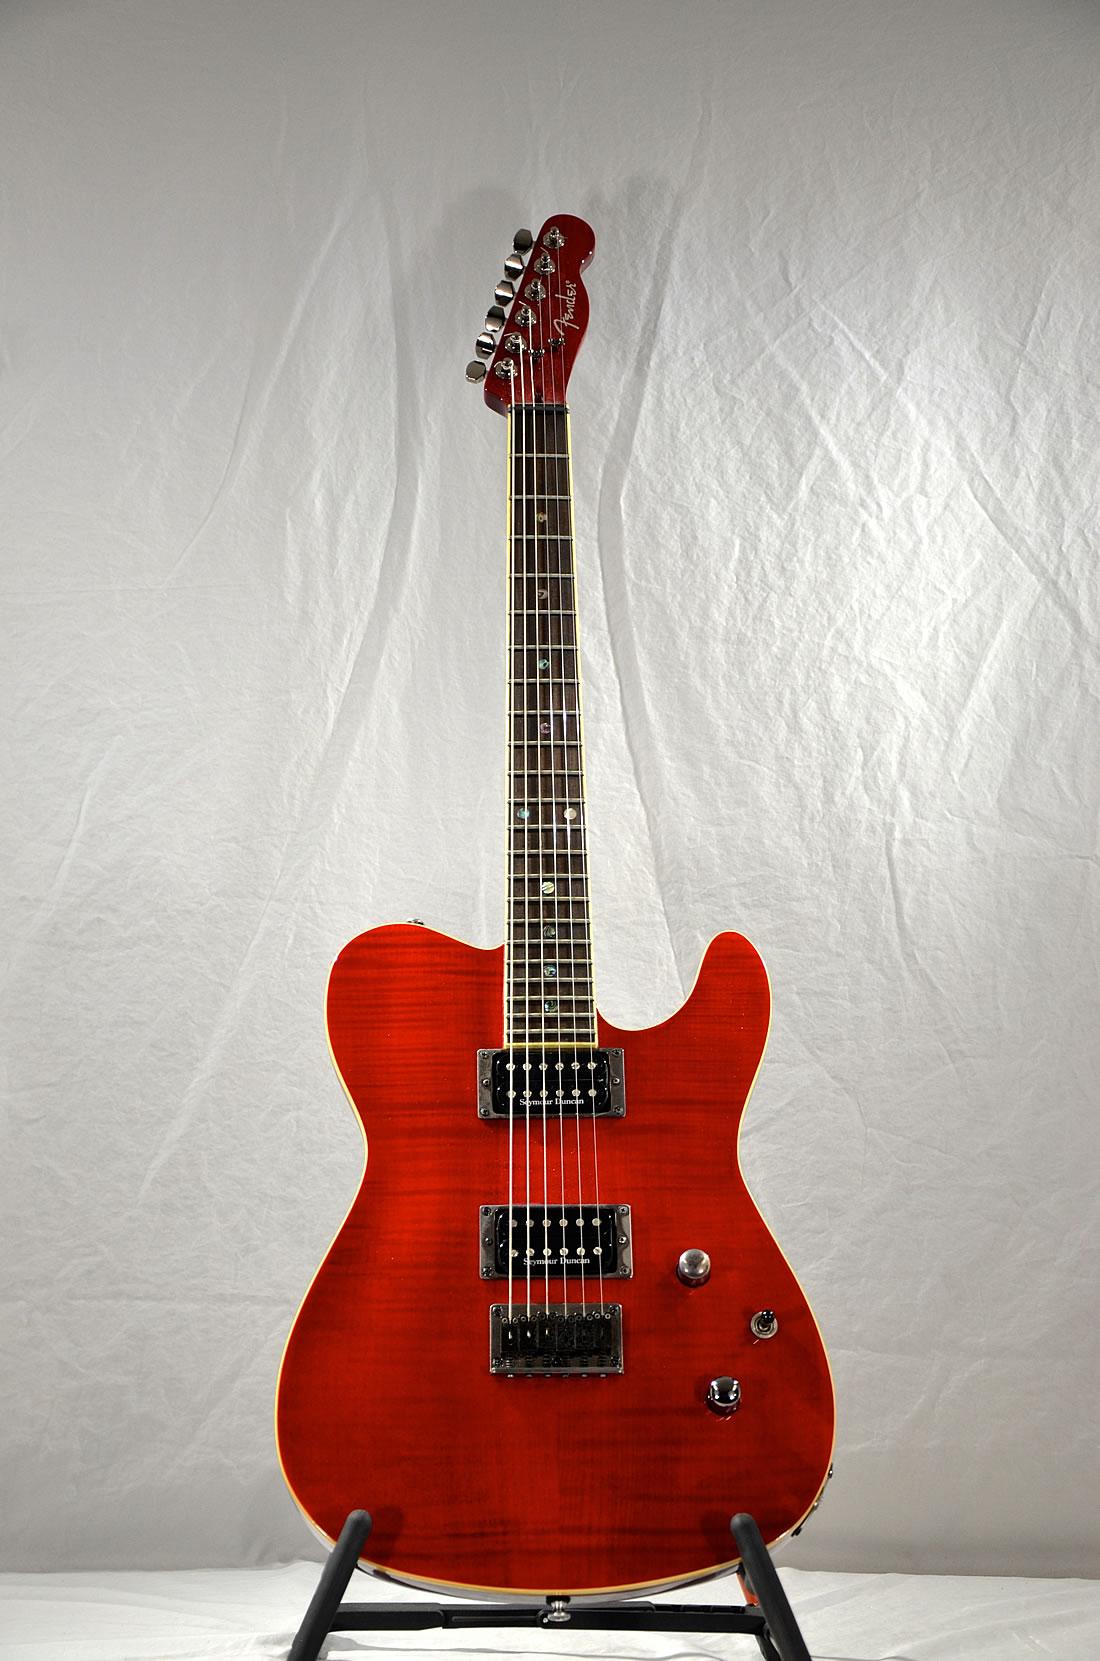 2010 Fender FTM Telecaster Guitar